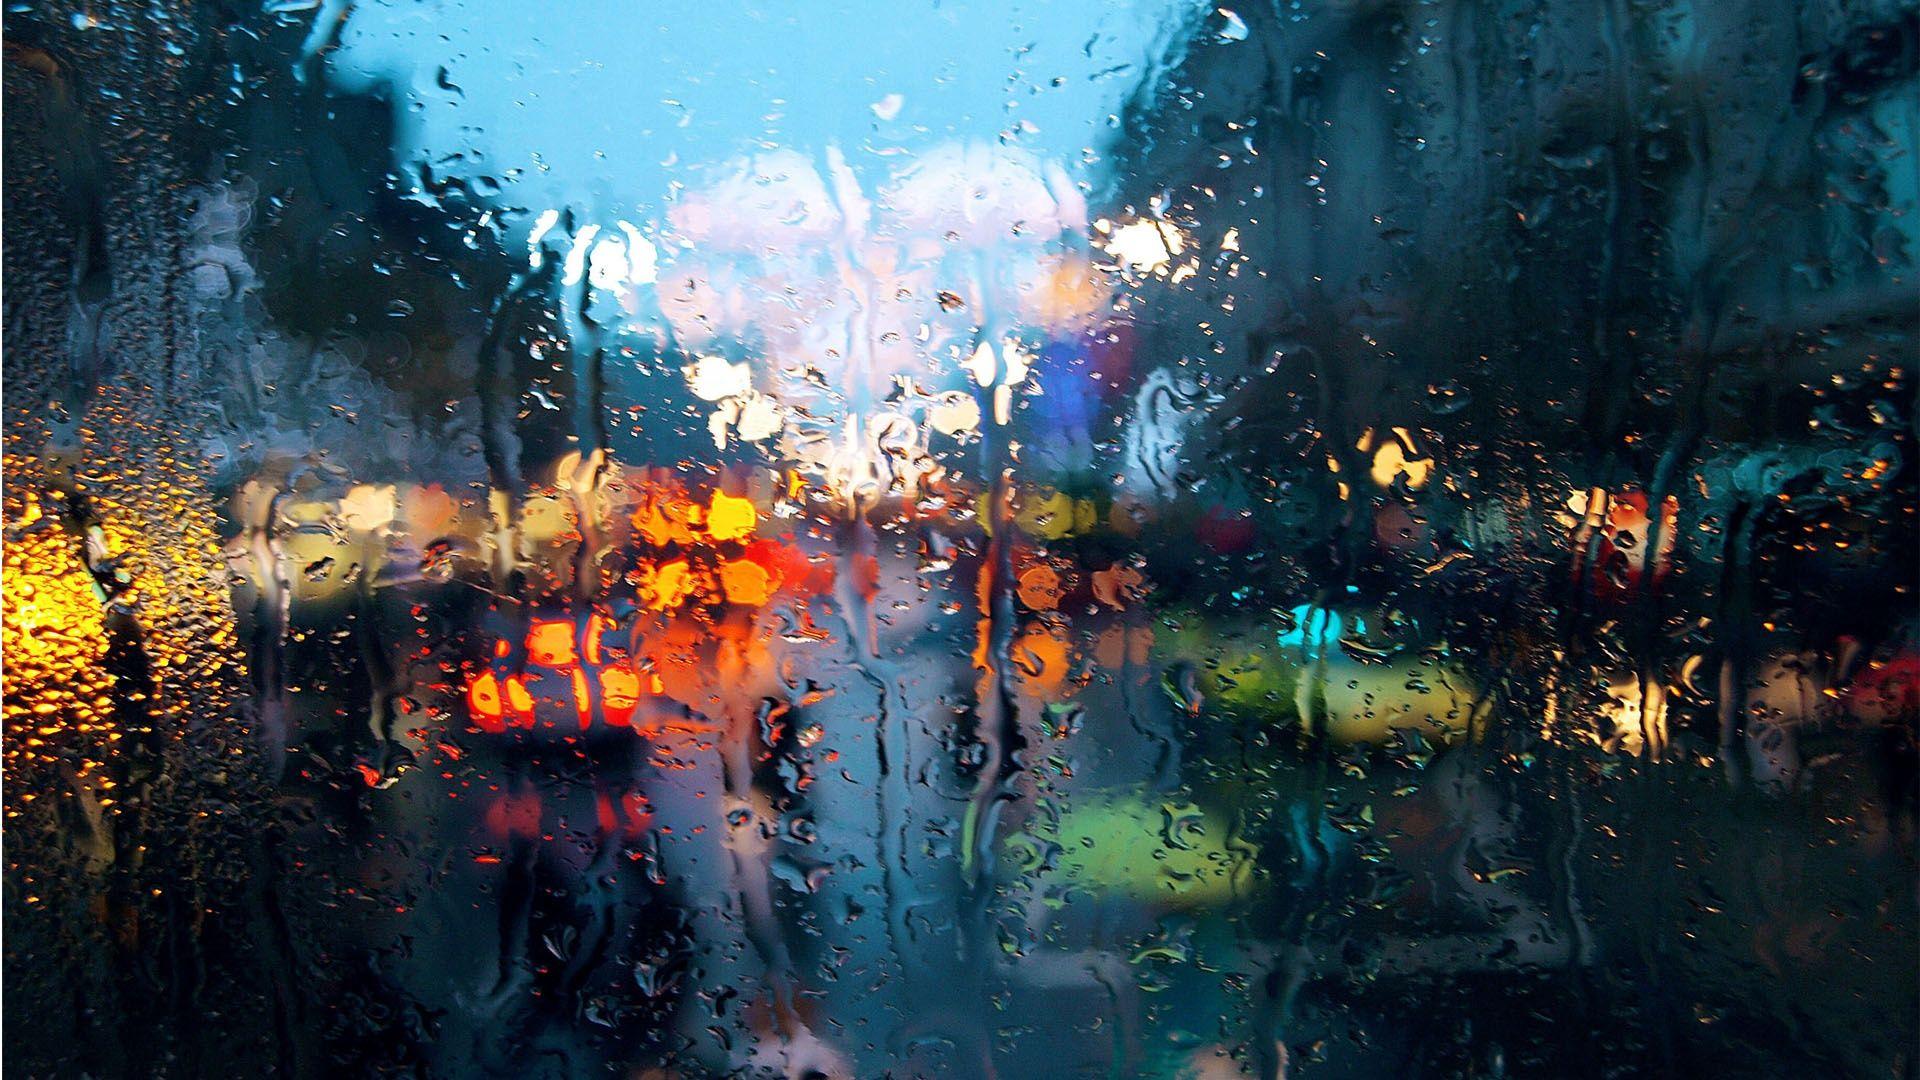 Massive Hd Wallpaper Dump 1 100 High Resolution Rain Wallpapers Cover Pics Music Cover Photos